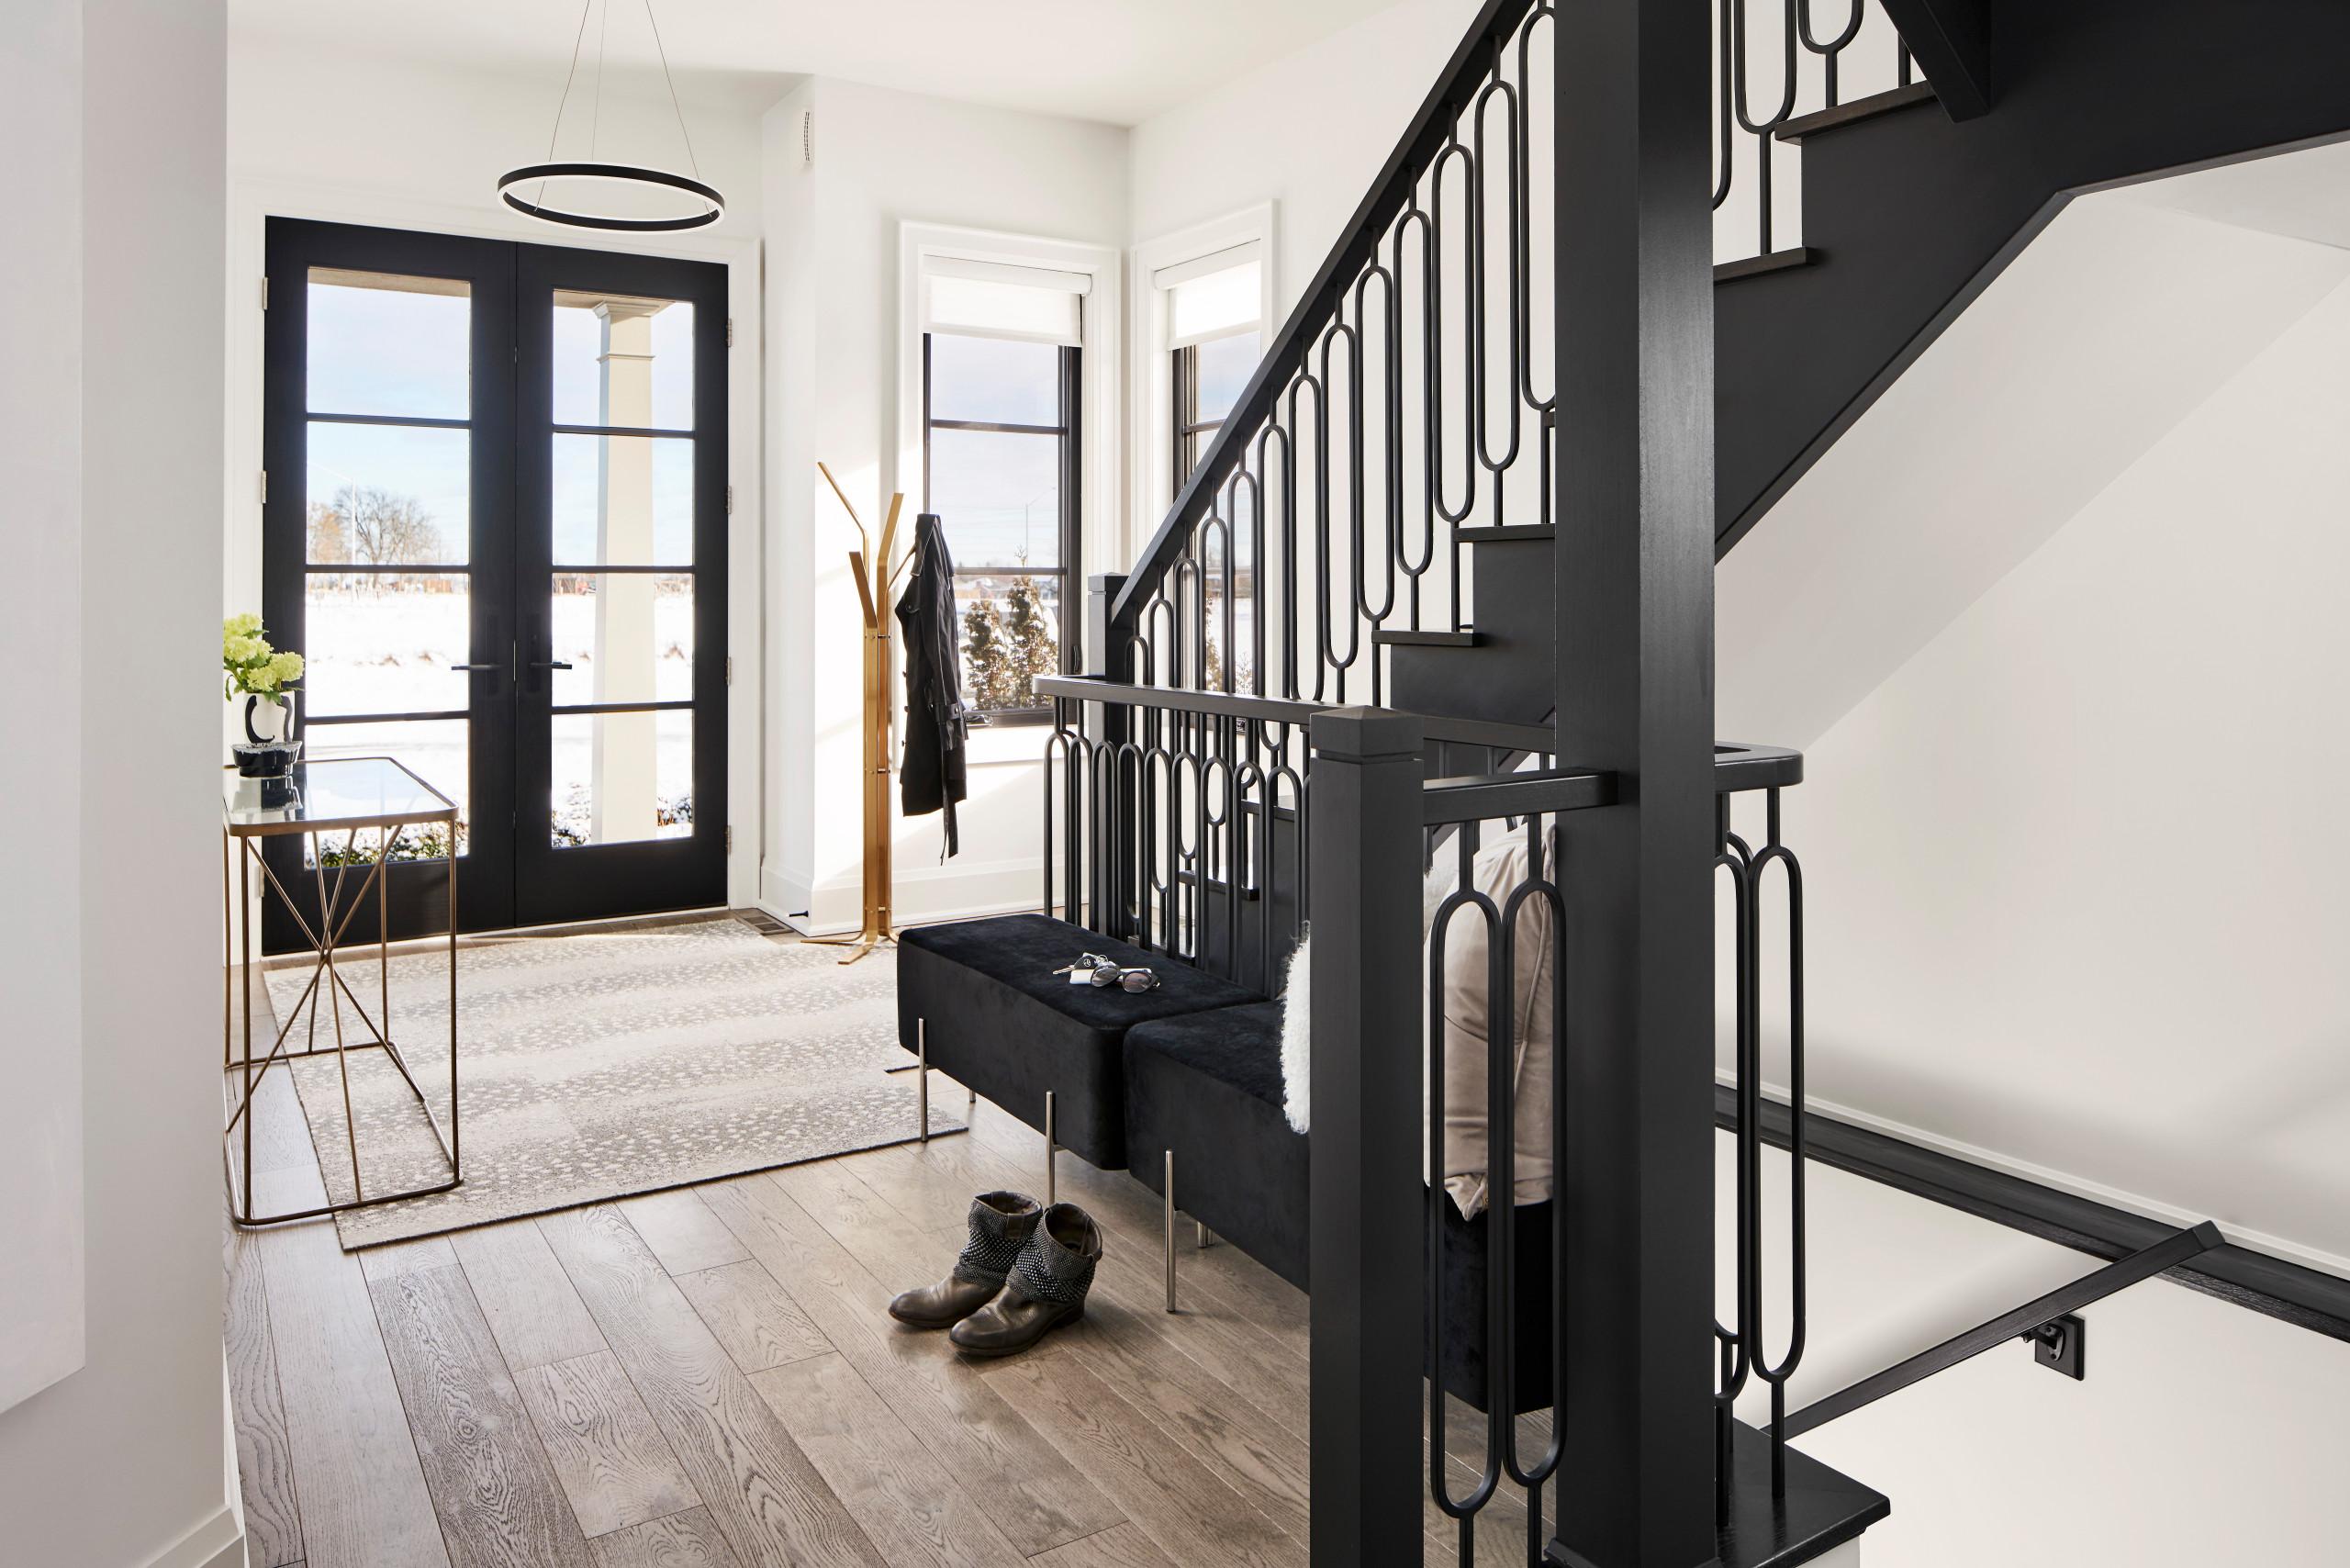 75 Beautiful Double Front Door Pictures Ideas January 2021 Houzz